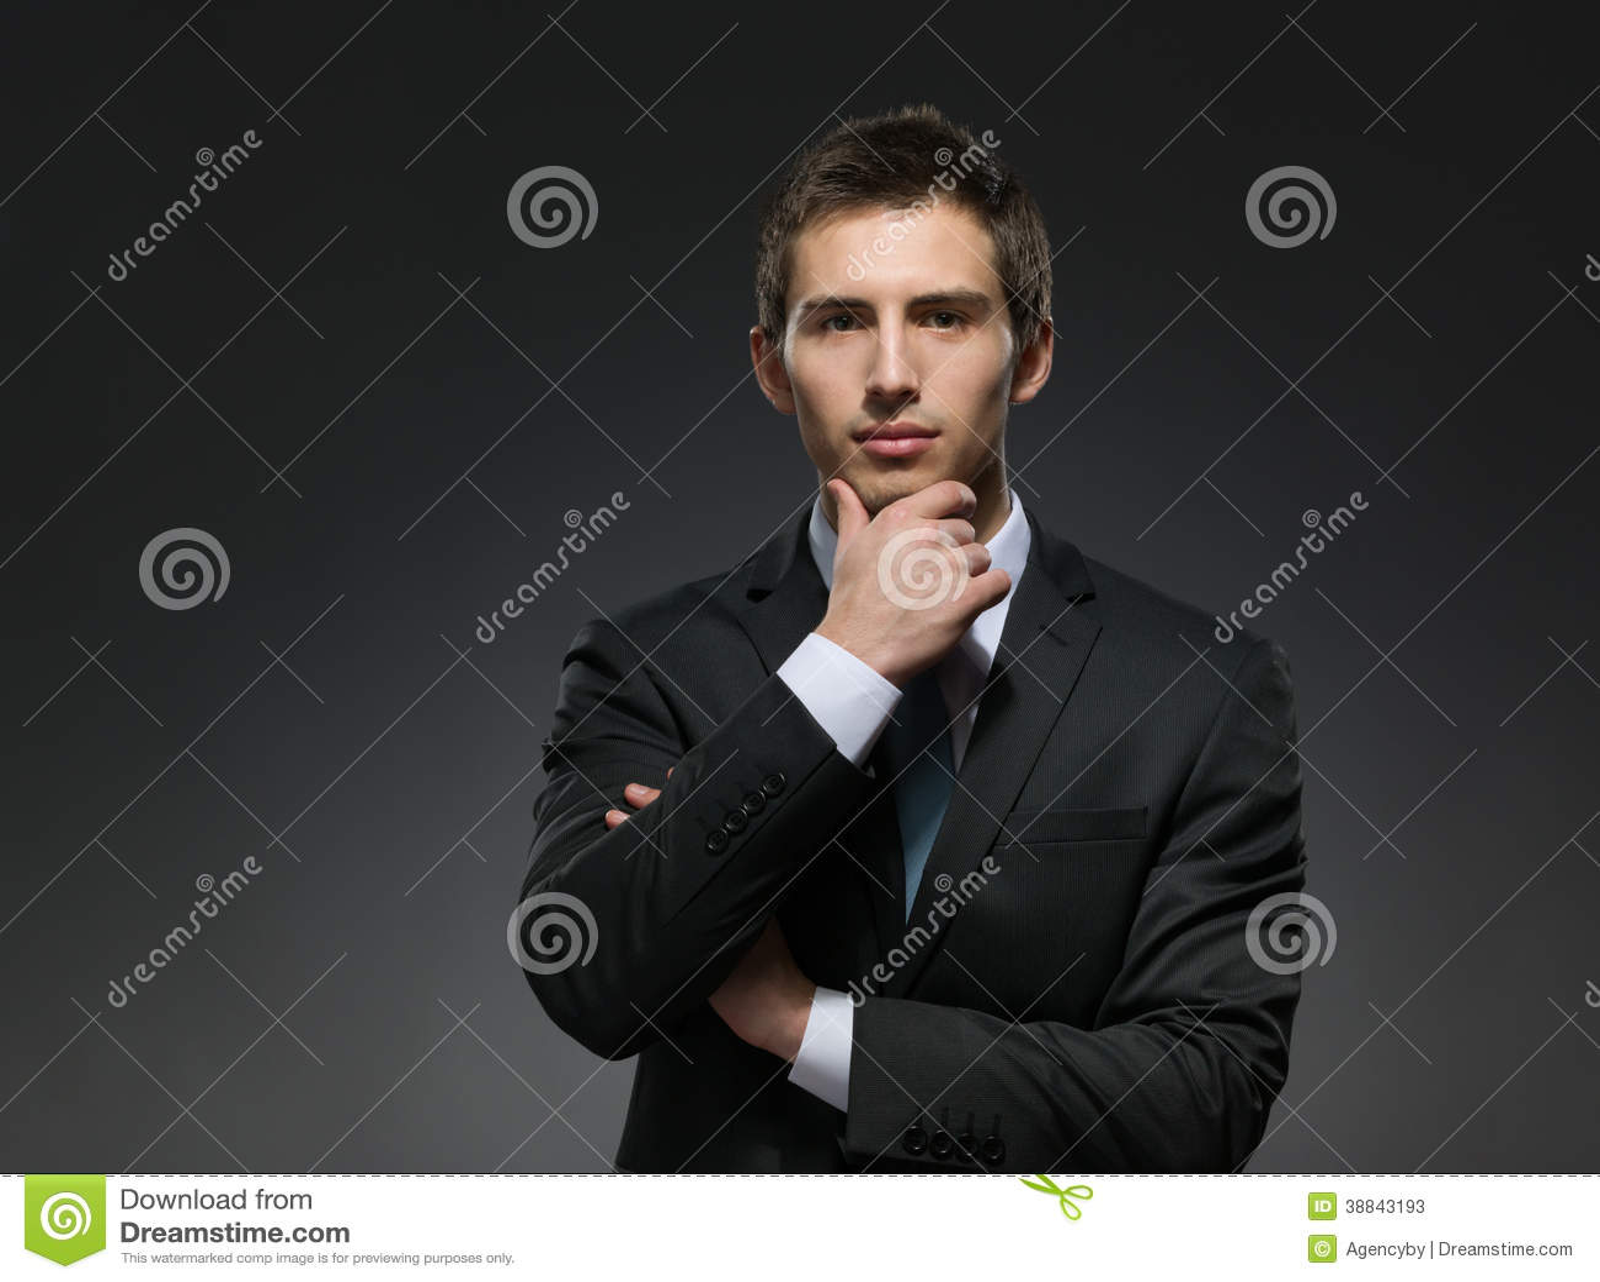 Guy Face Pensive